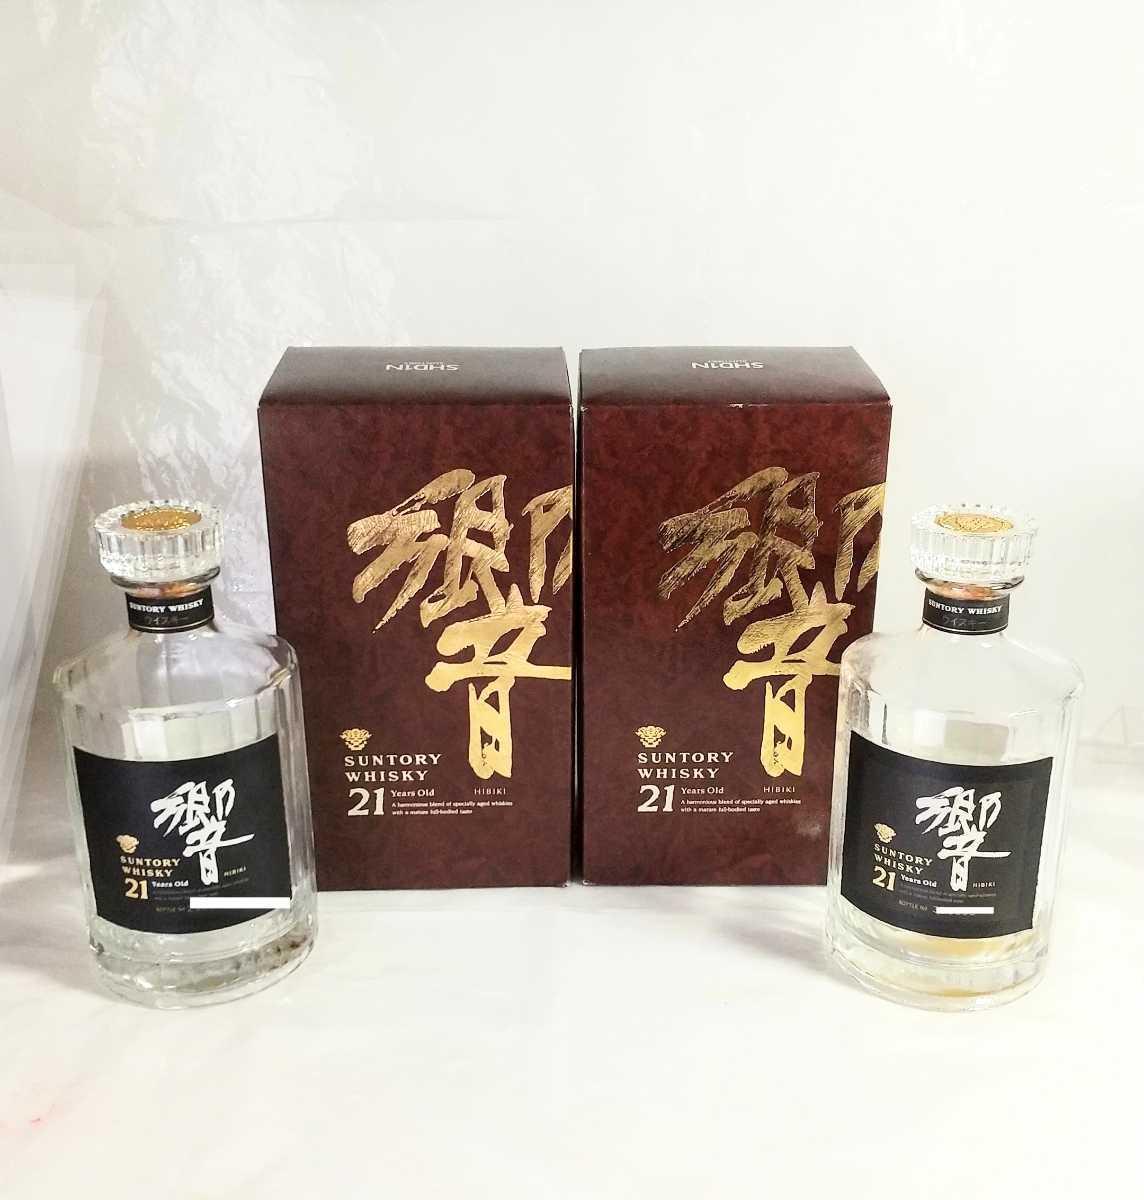 Rare ★ 箱 ★ 空ビン ★ SUNTORY サントリー 響 21年 ウイスキー 空瓶 響21年   ビン whisky  箱 カートン 化粧箱 空箱 box_画像4